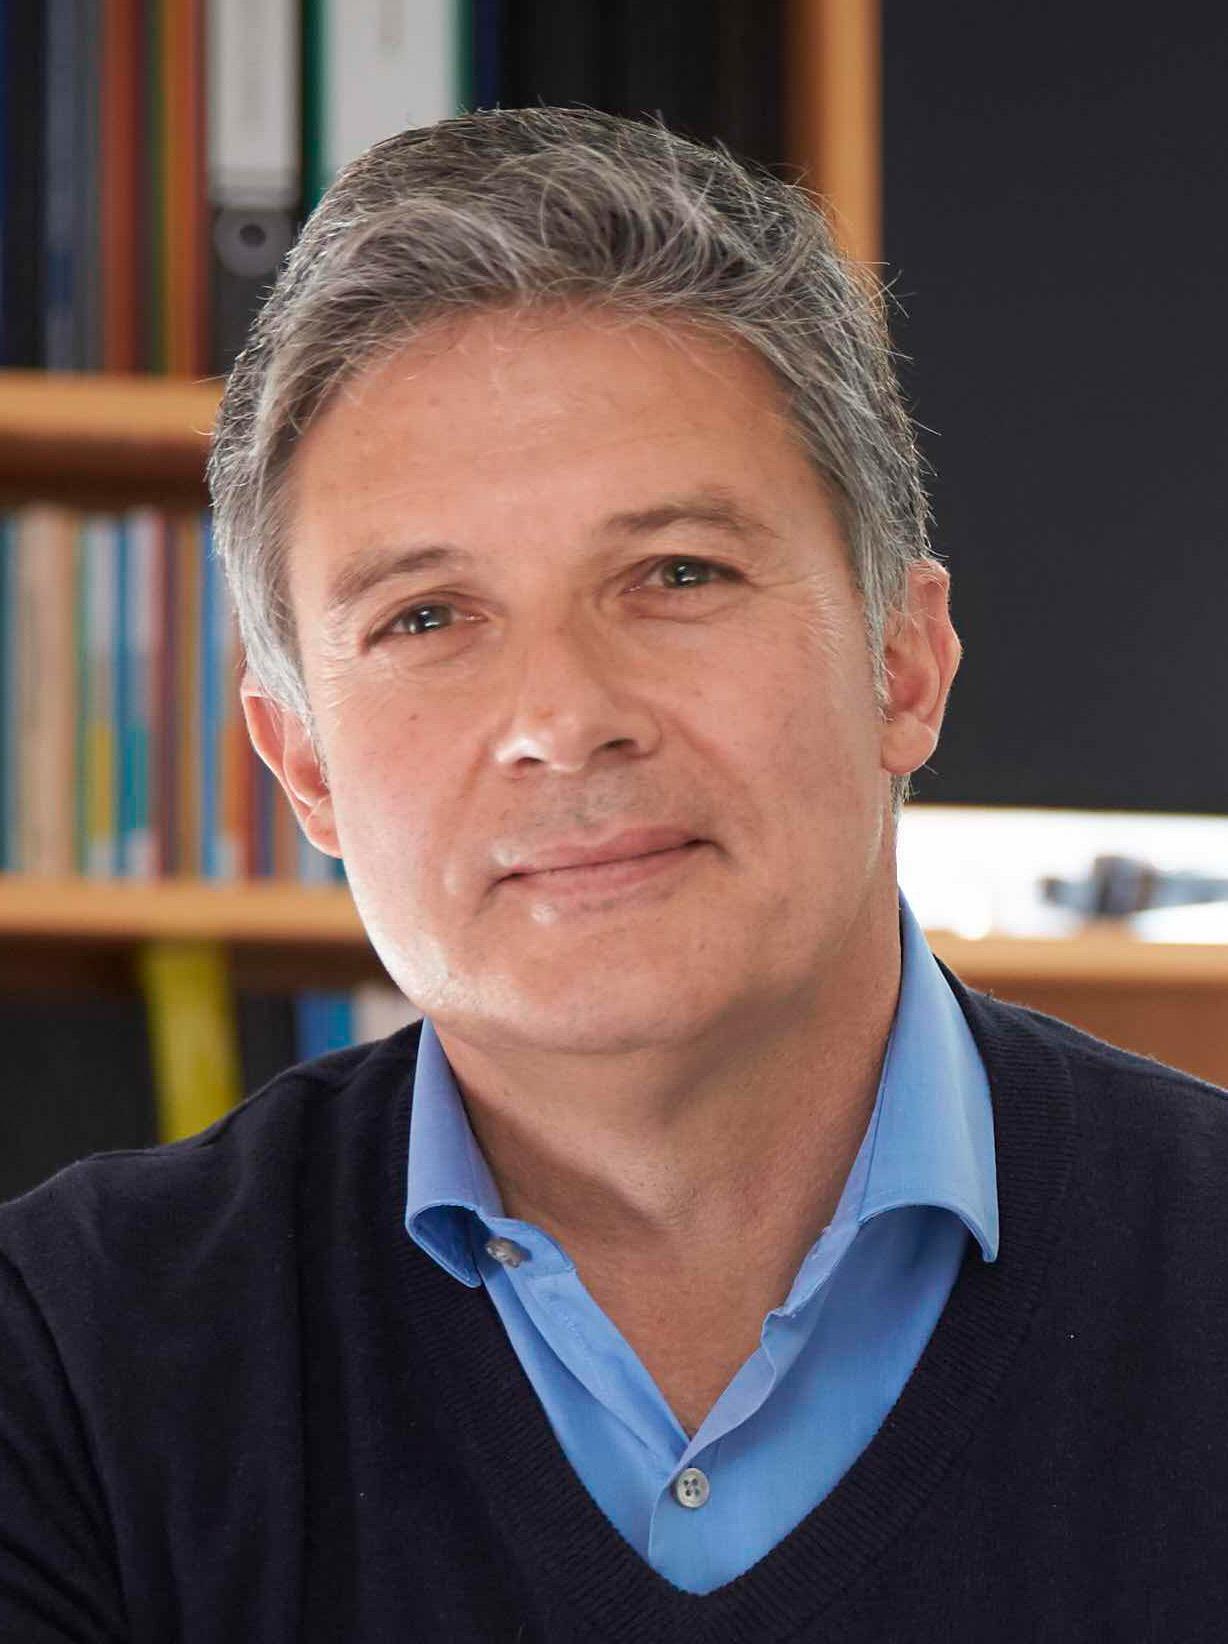 Prof. Dr. Eckhard Wolf